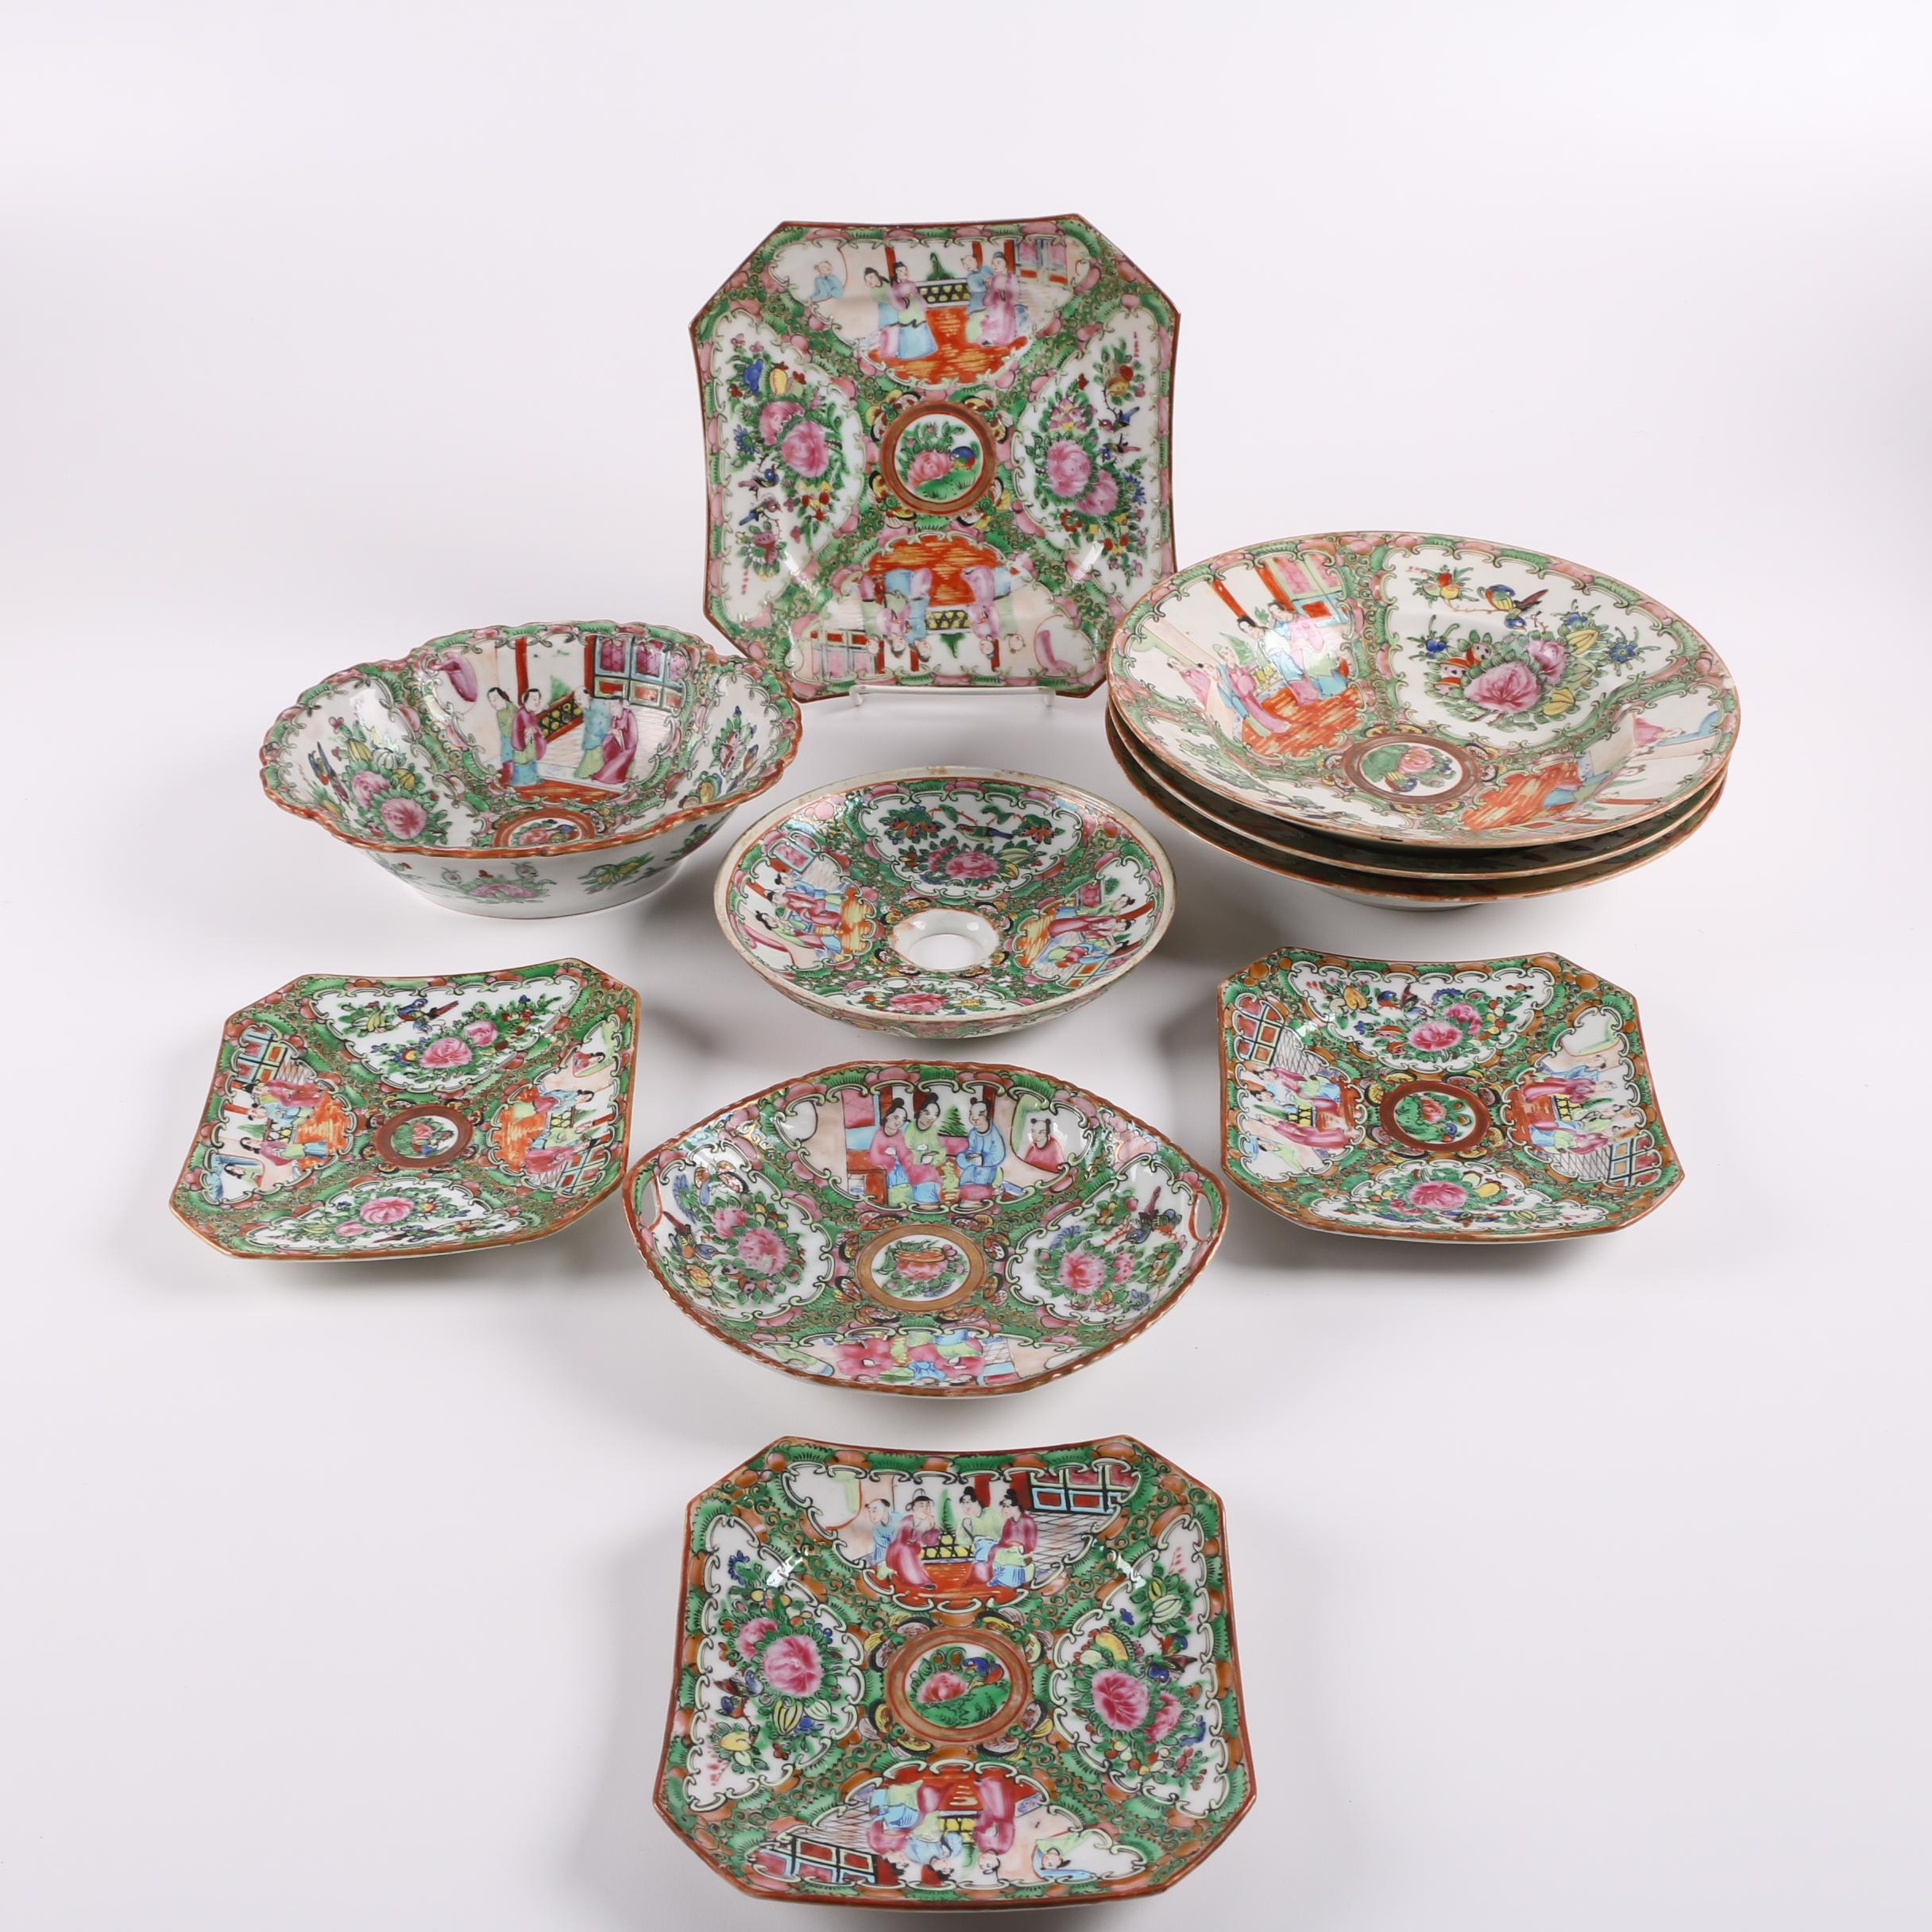 Early 20th Century Chinese Rose Medallion Porcelain Dinnerware